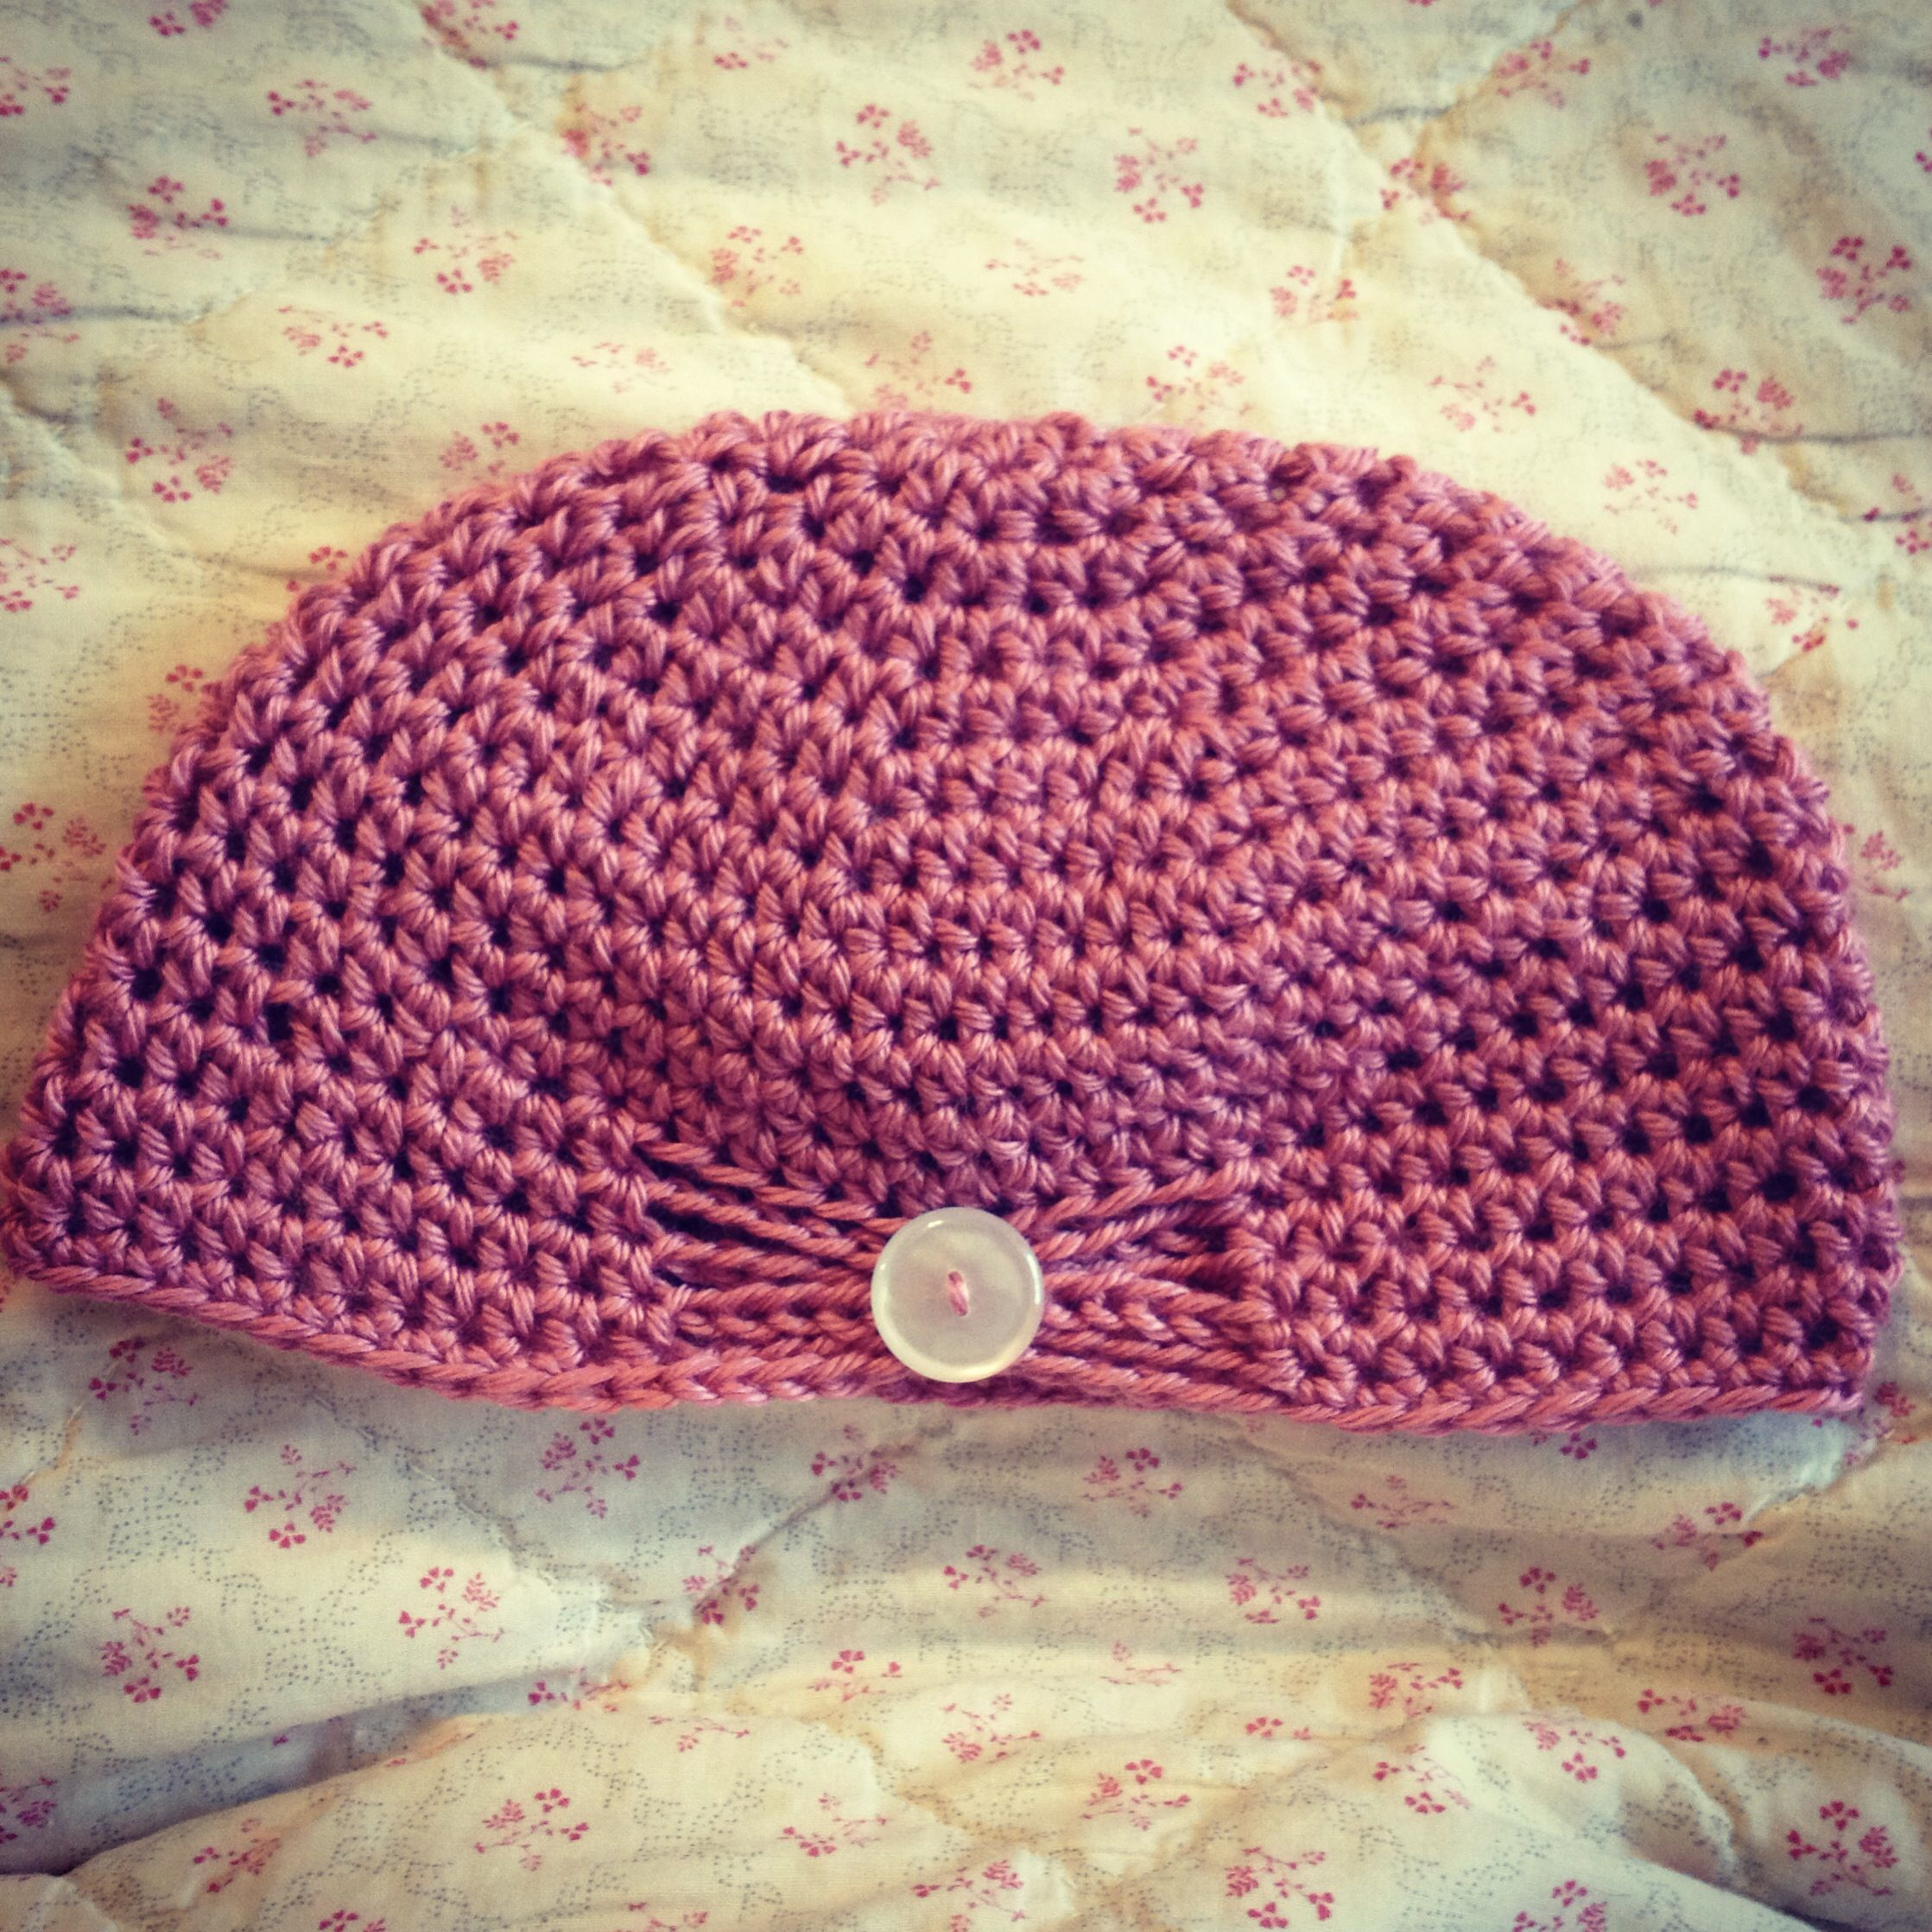 Crochet Patterns Chemo Caps : Crochet chemo cap CHEMO CAPS Pinterest